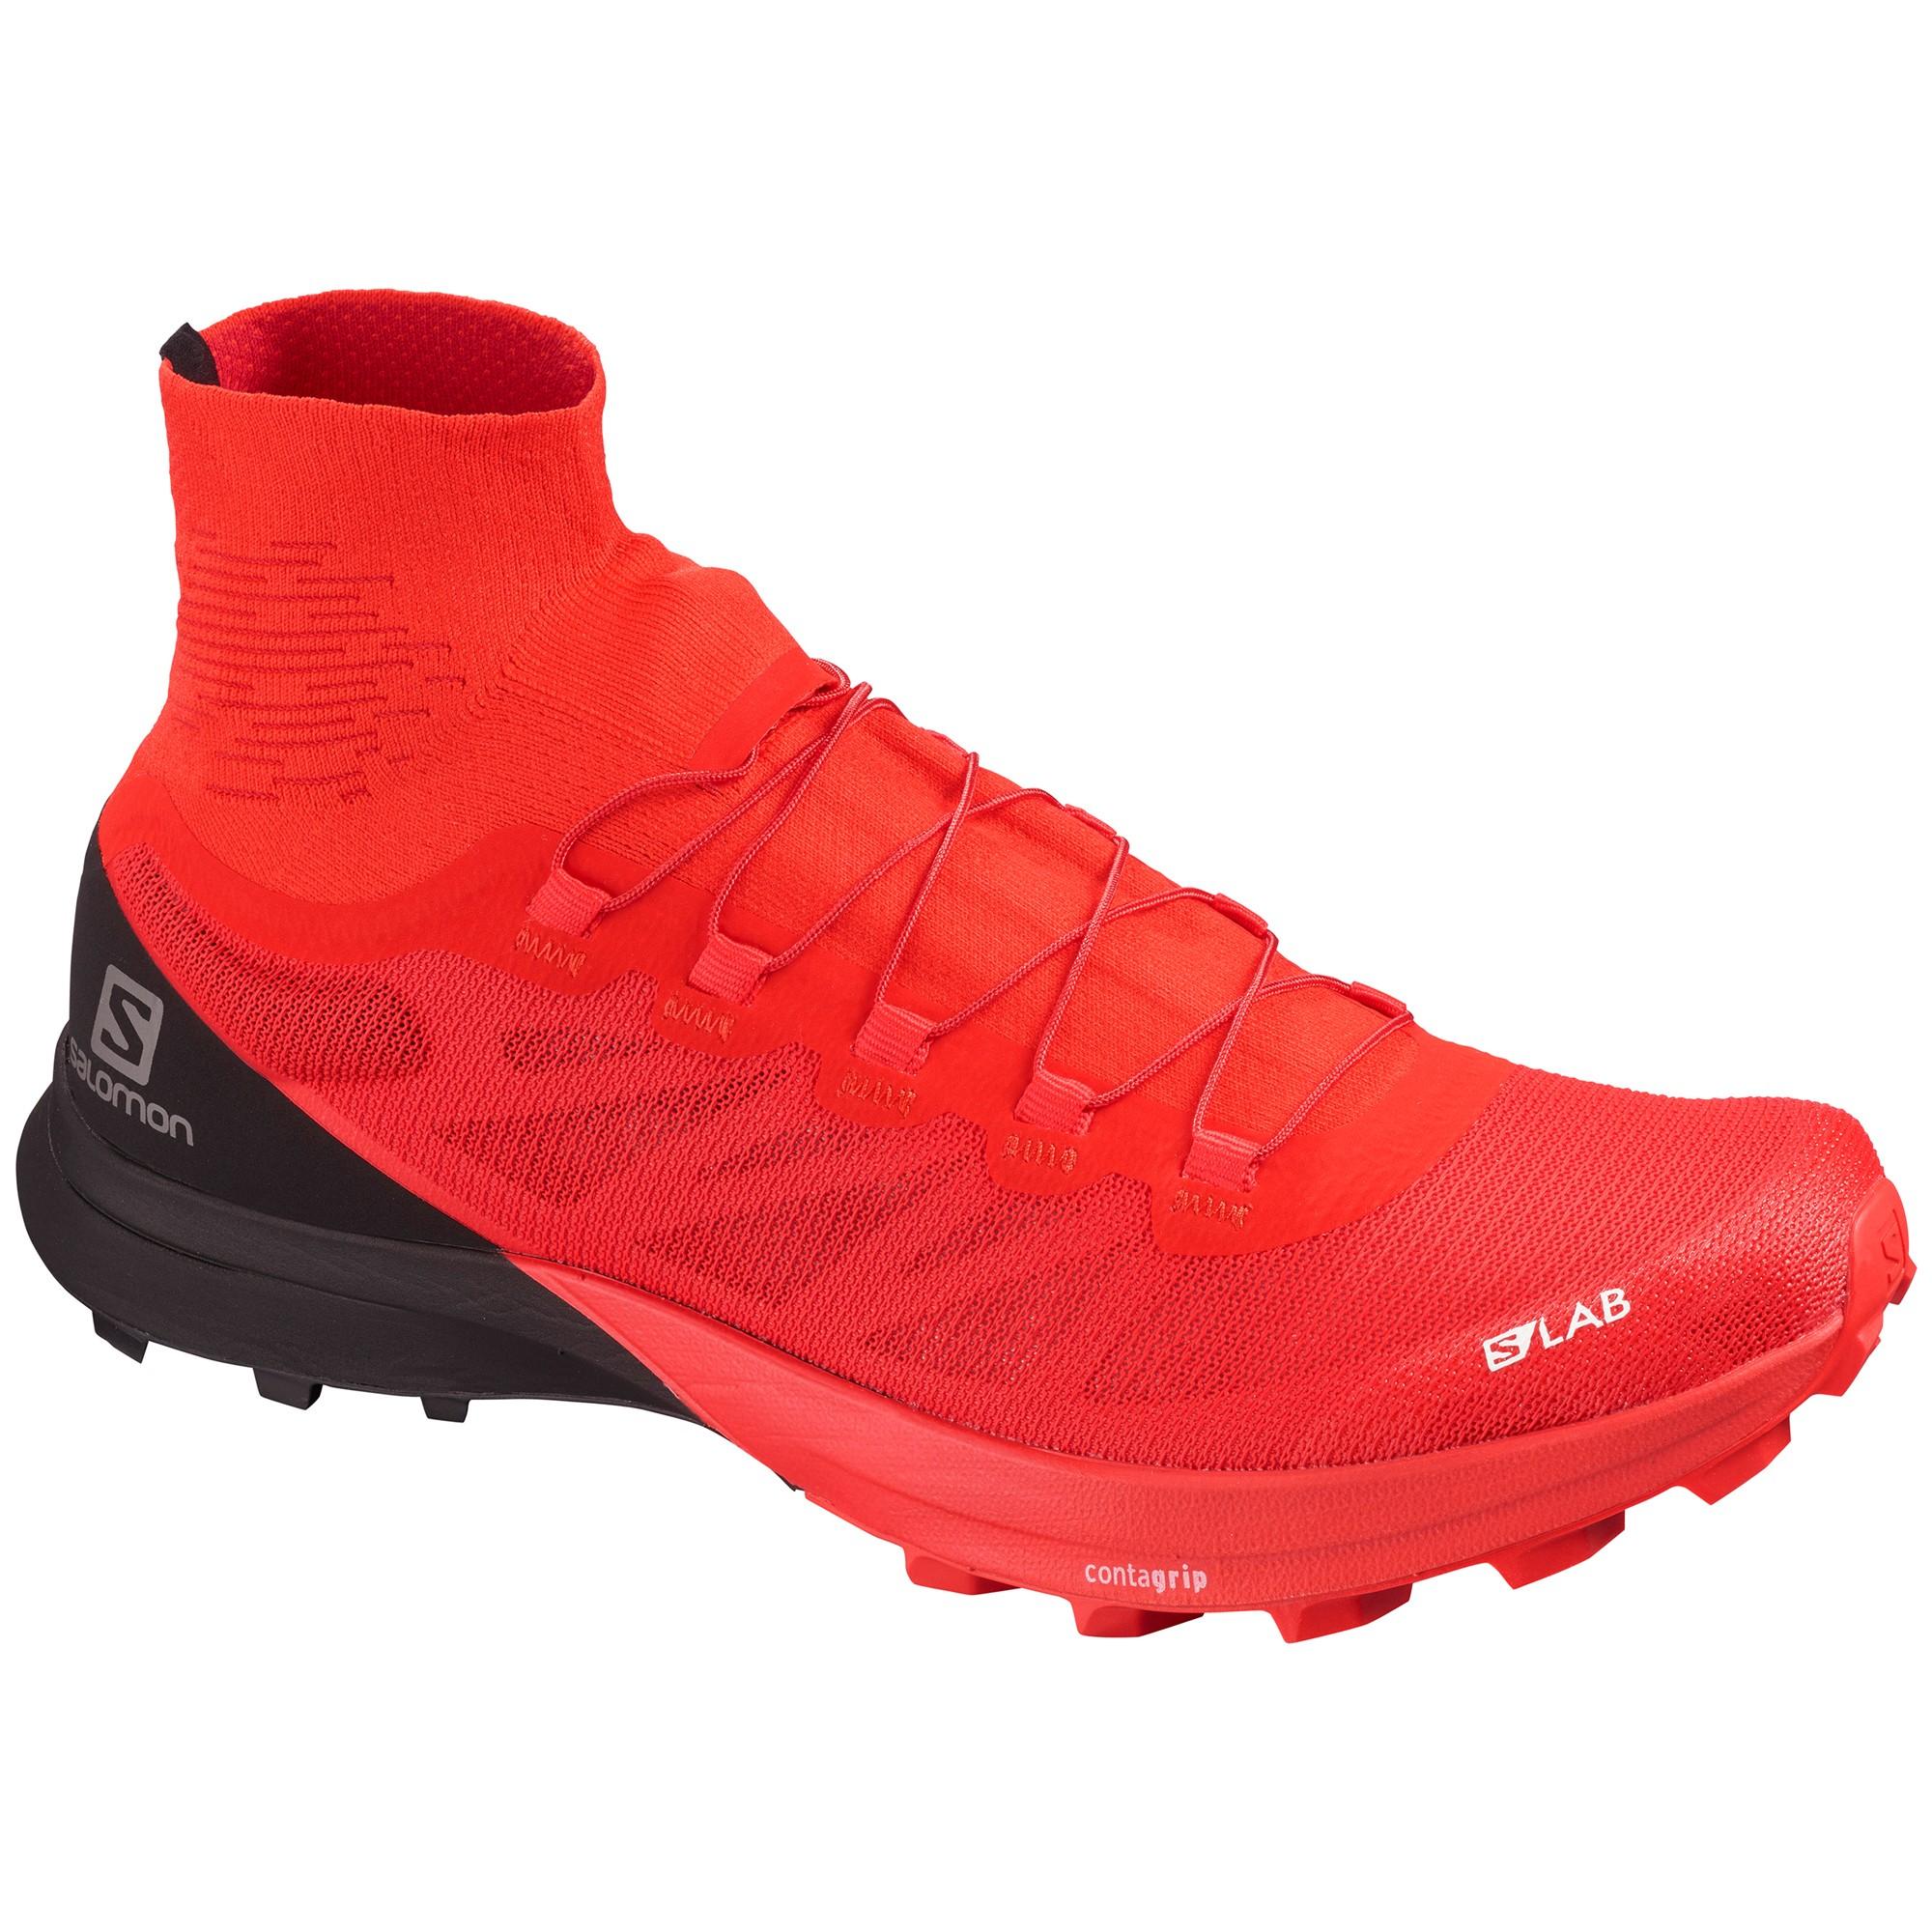 salomon trail running shoes warranty qatar